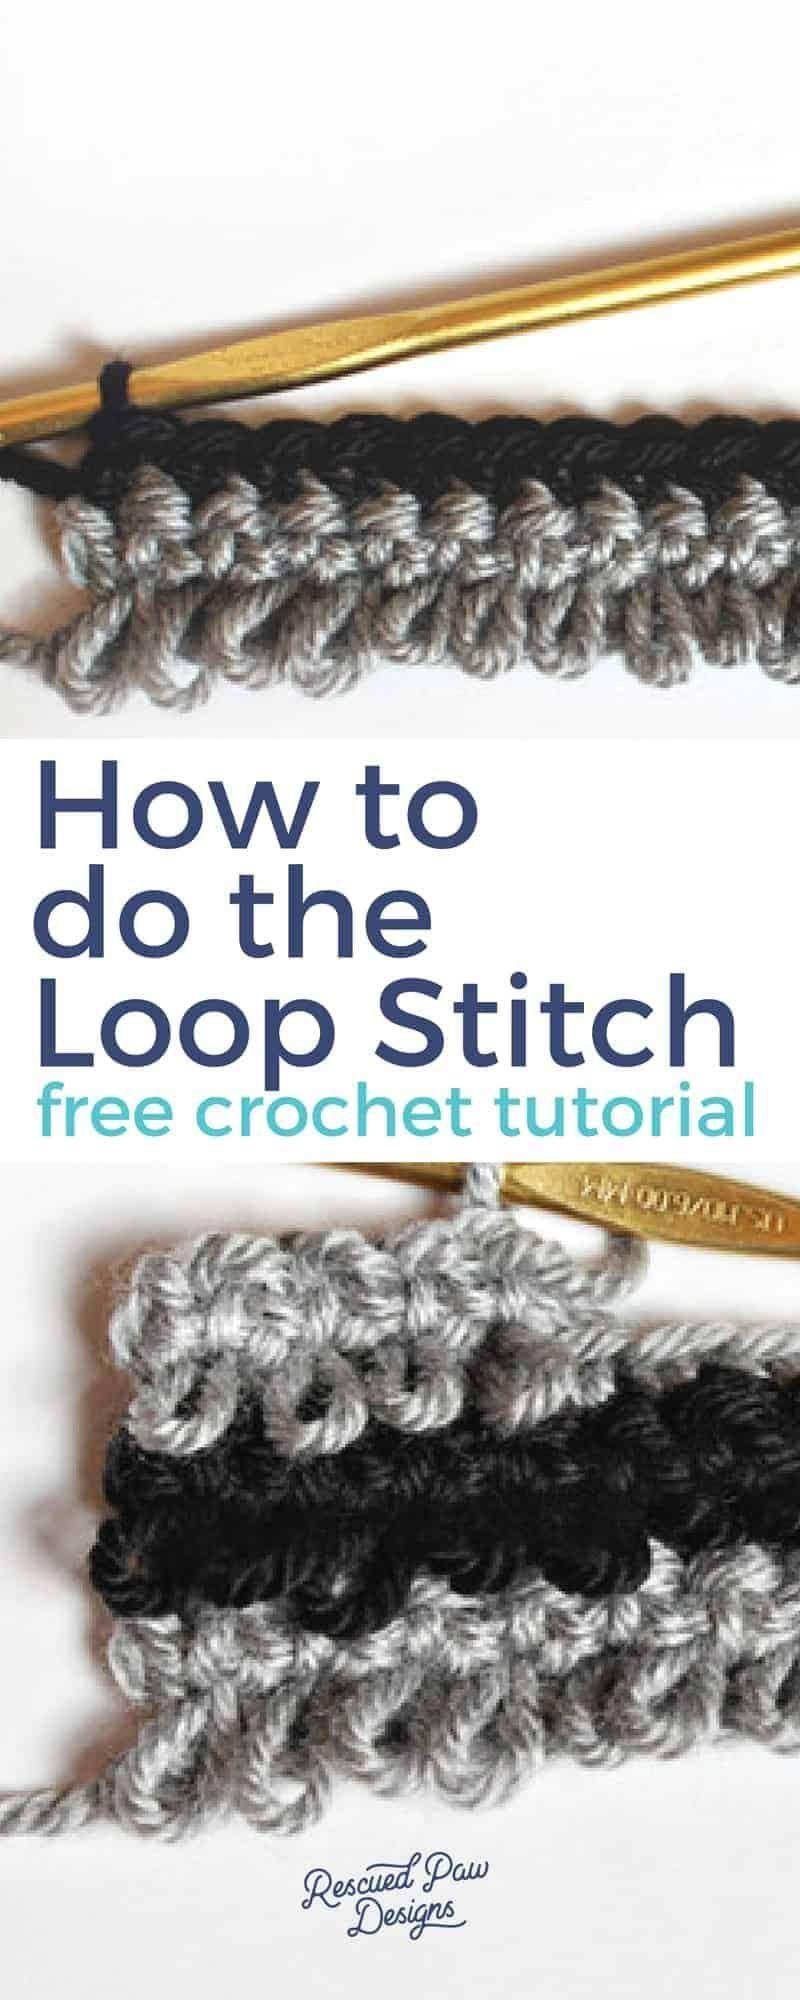 Crochet Loop Stitch Tutorial | Crochet stitches | Pinterest ...